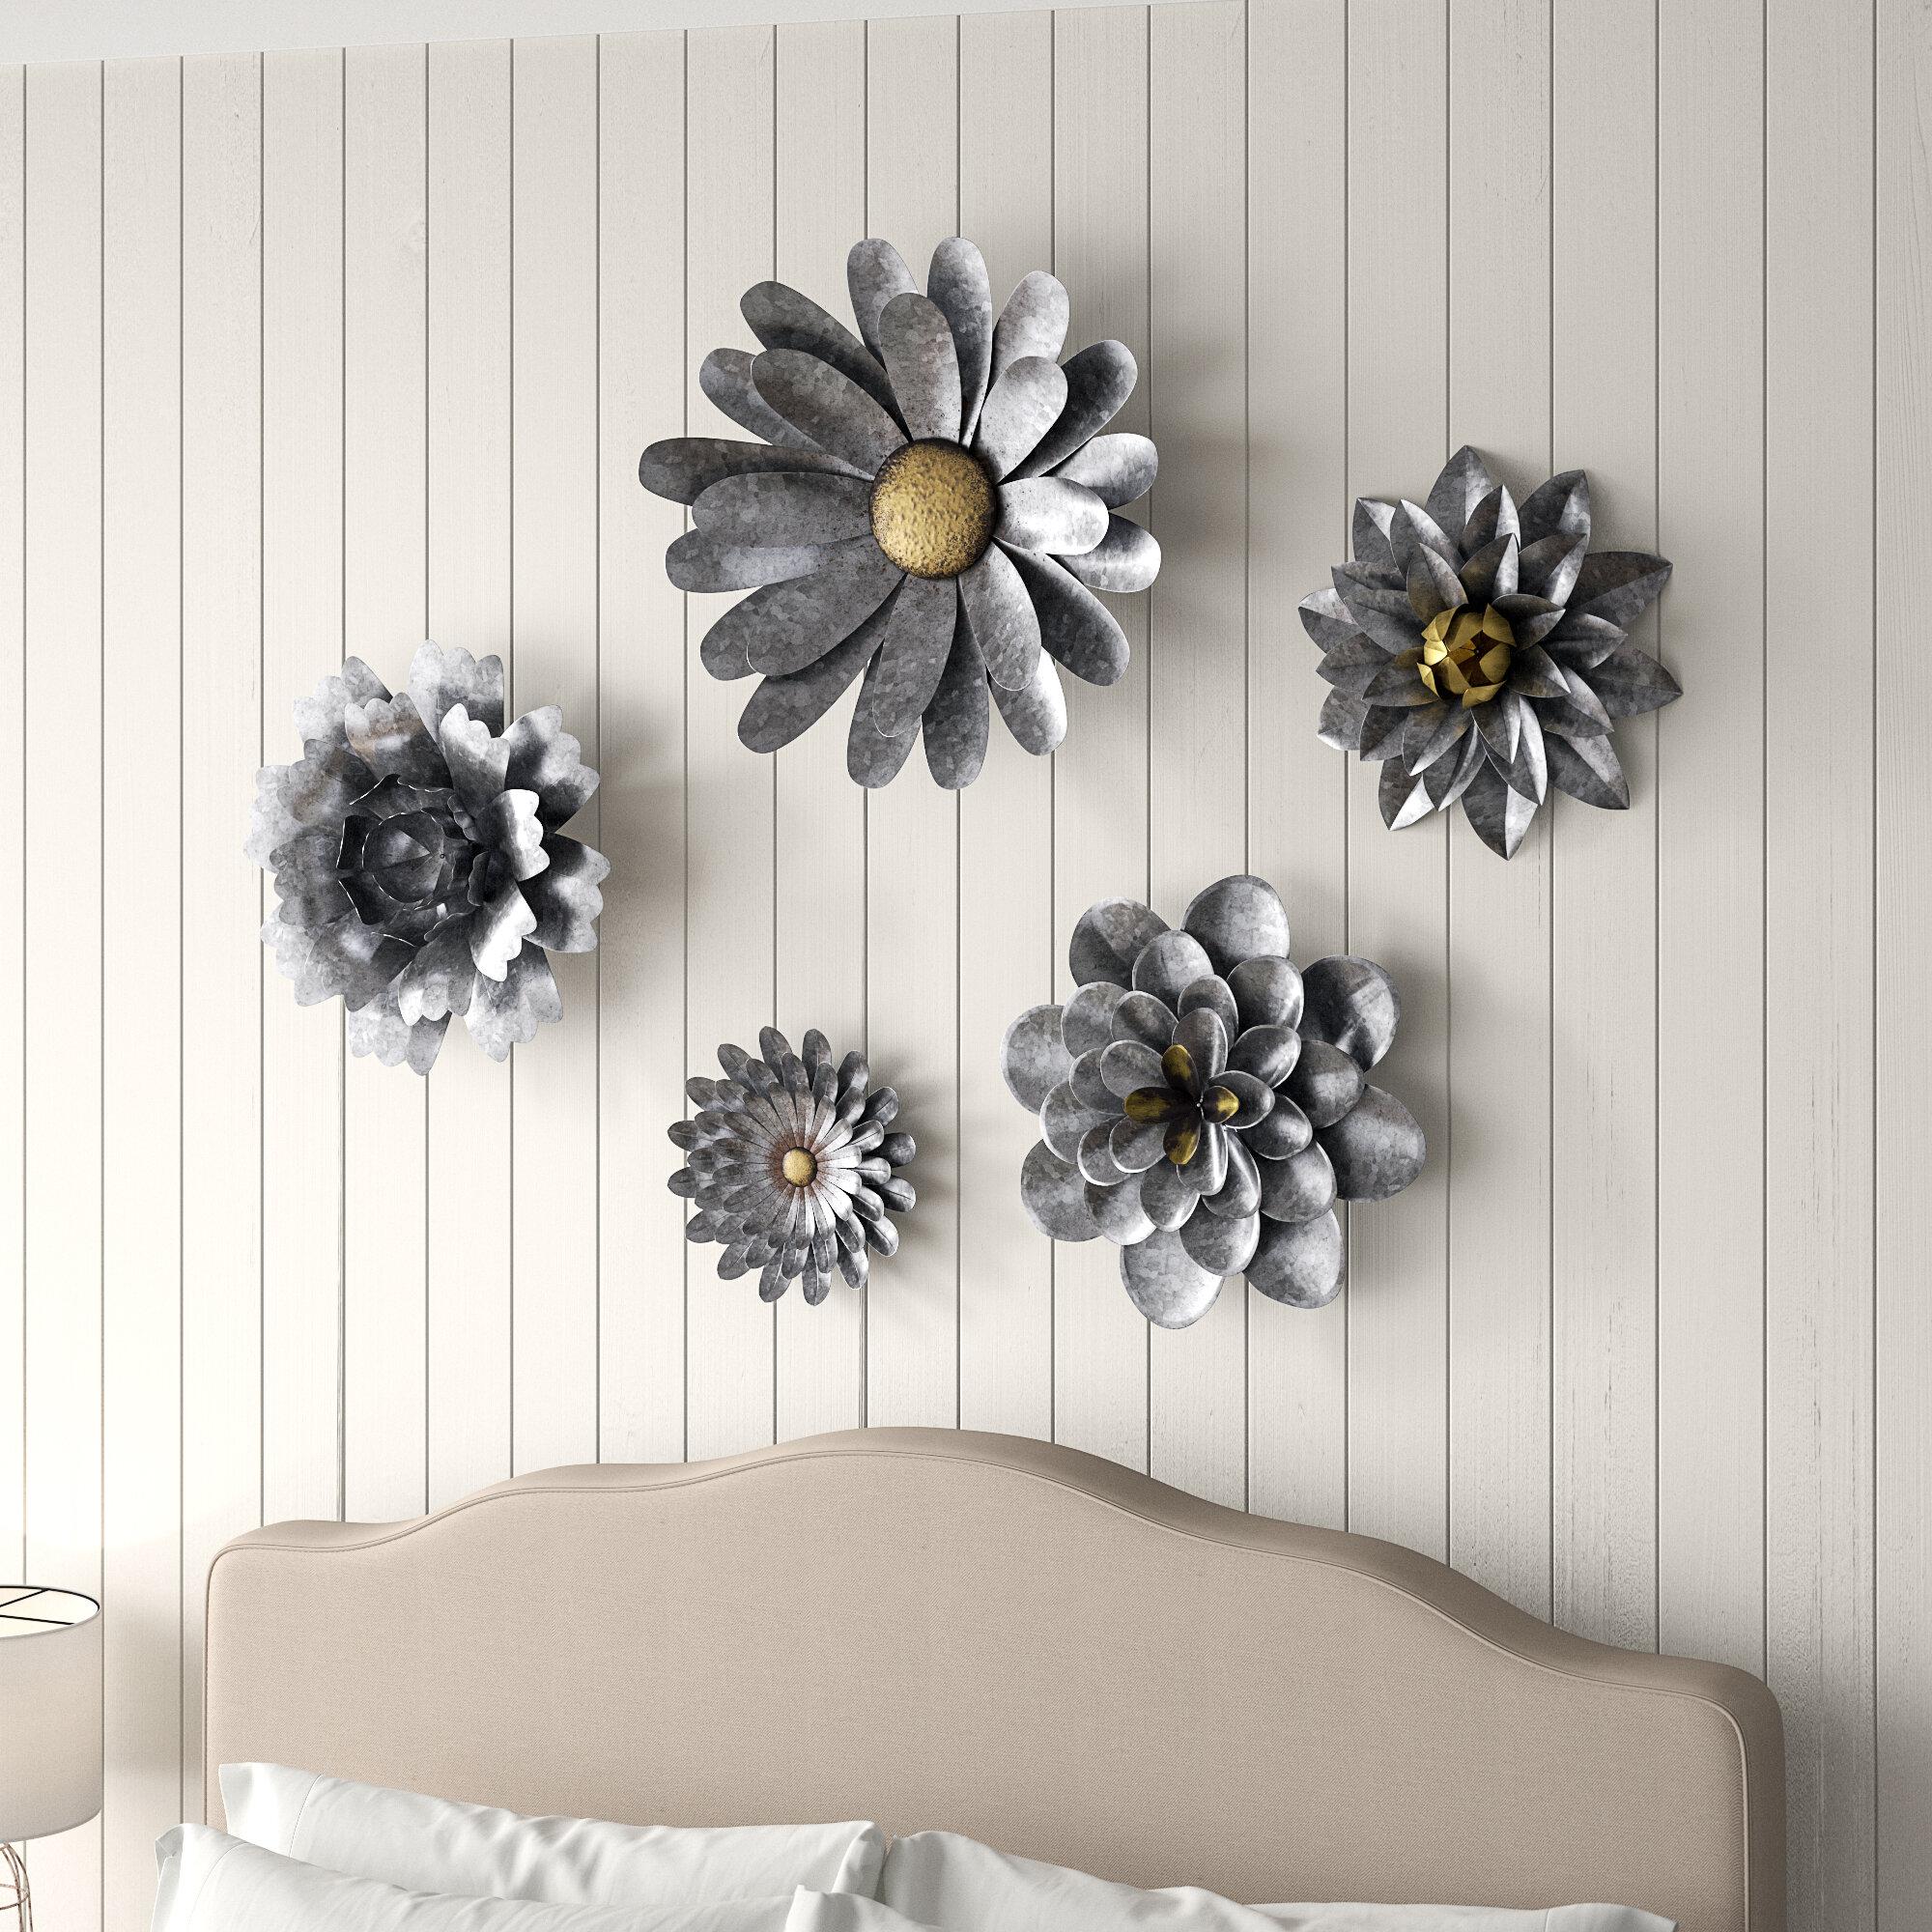 Gracie Oaks 5 Piece Galvanized Metal Flower Hanging Wall Decor Set